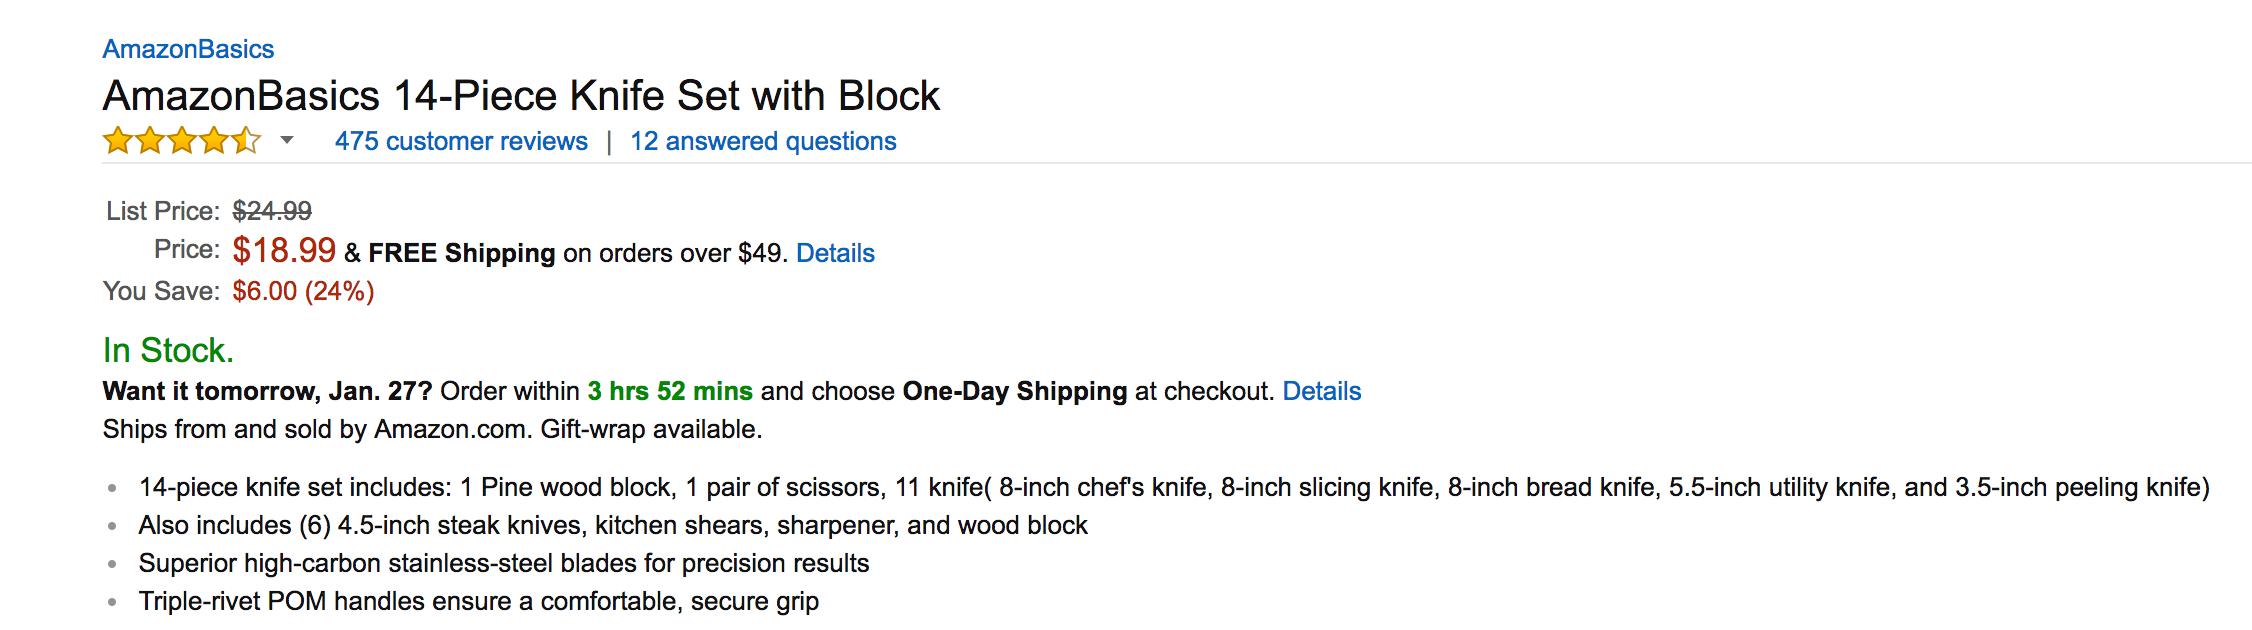 amazonbasics-knife-block-sale-02